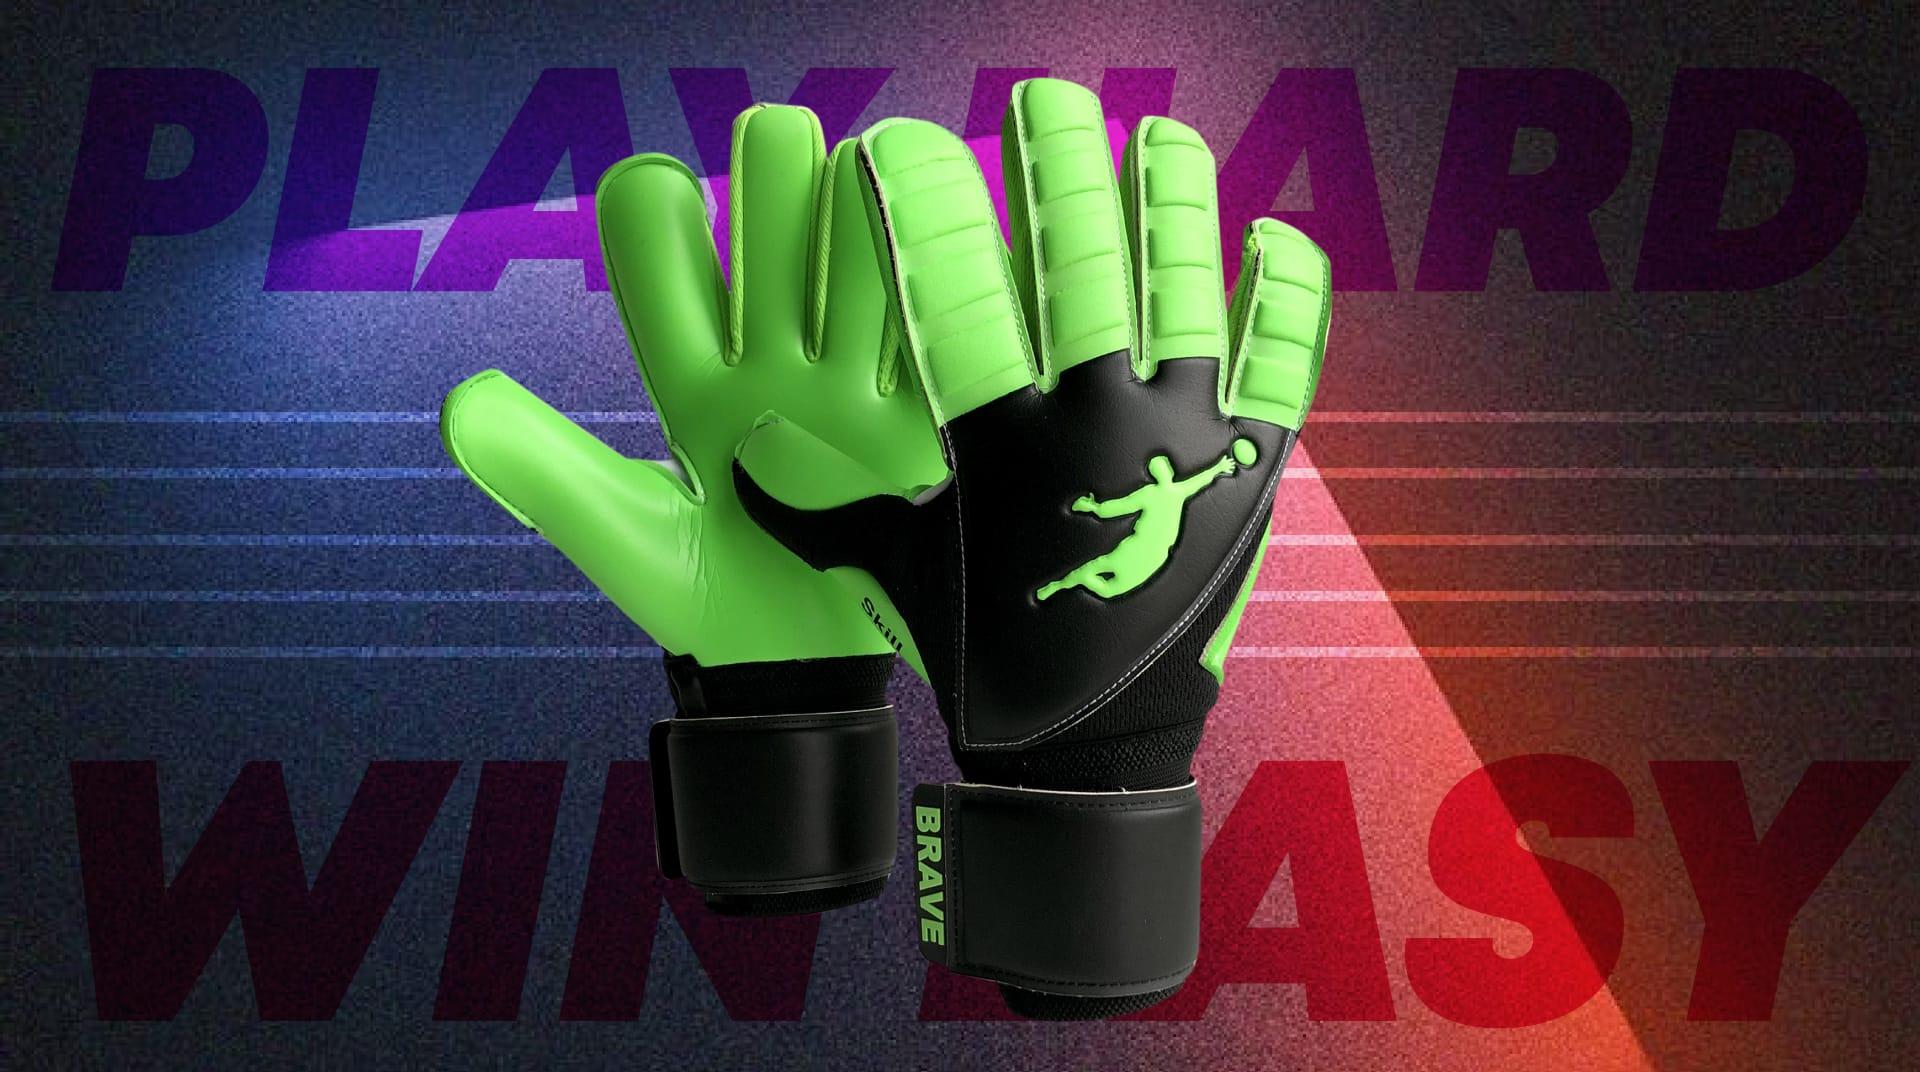 Вратарские перчатки Skill Green Flash - официальный интернет-магазин Brave GK